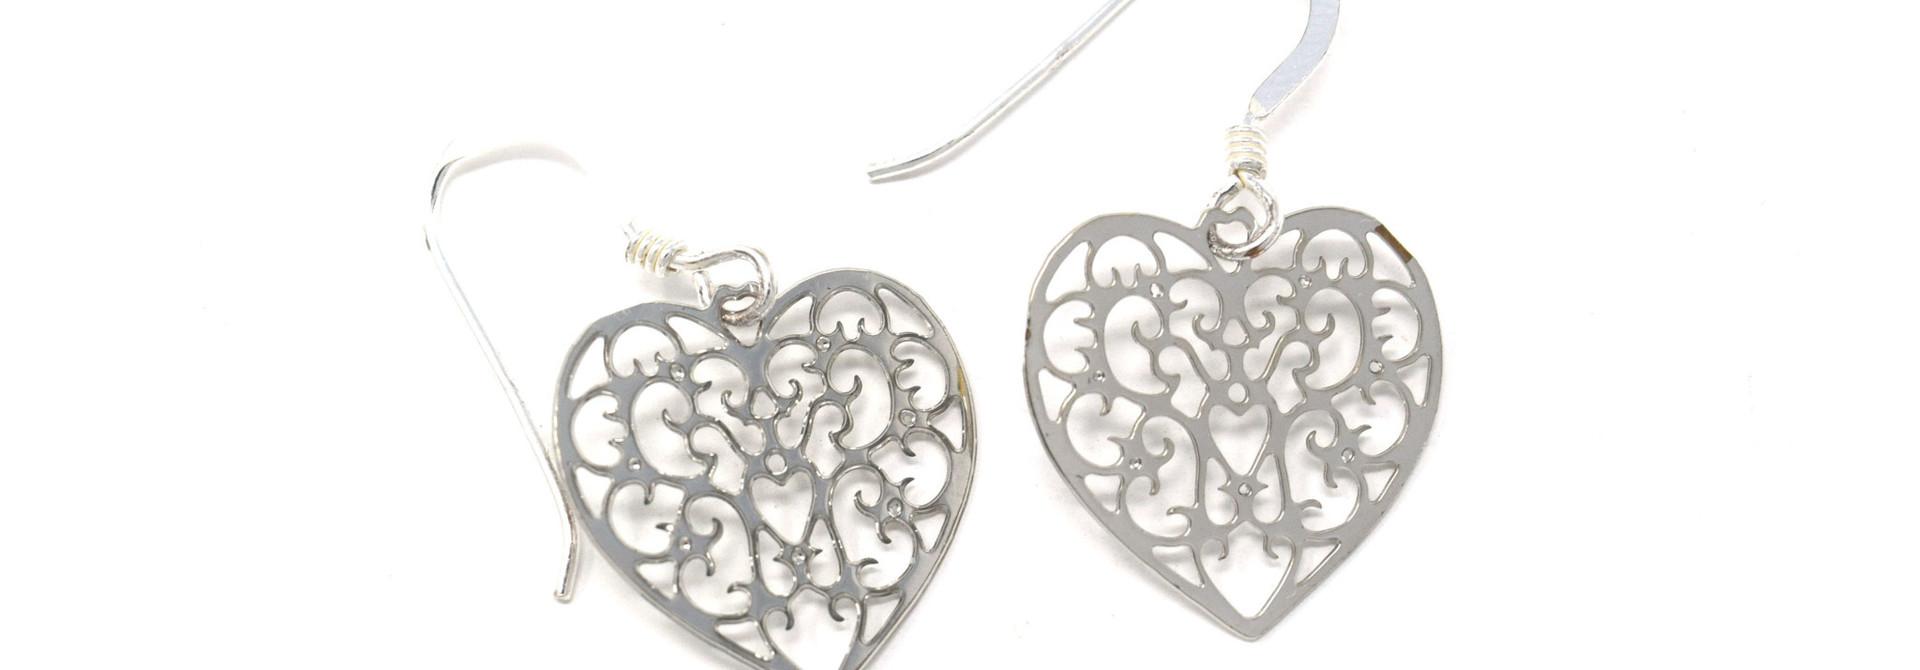 Filigree Heart Earring